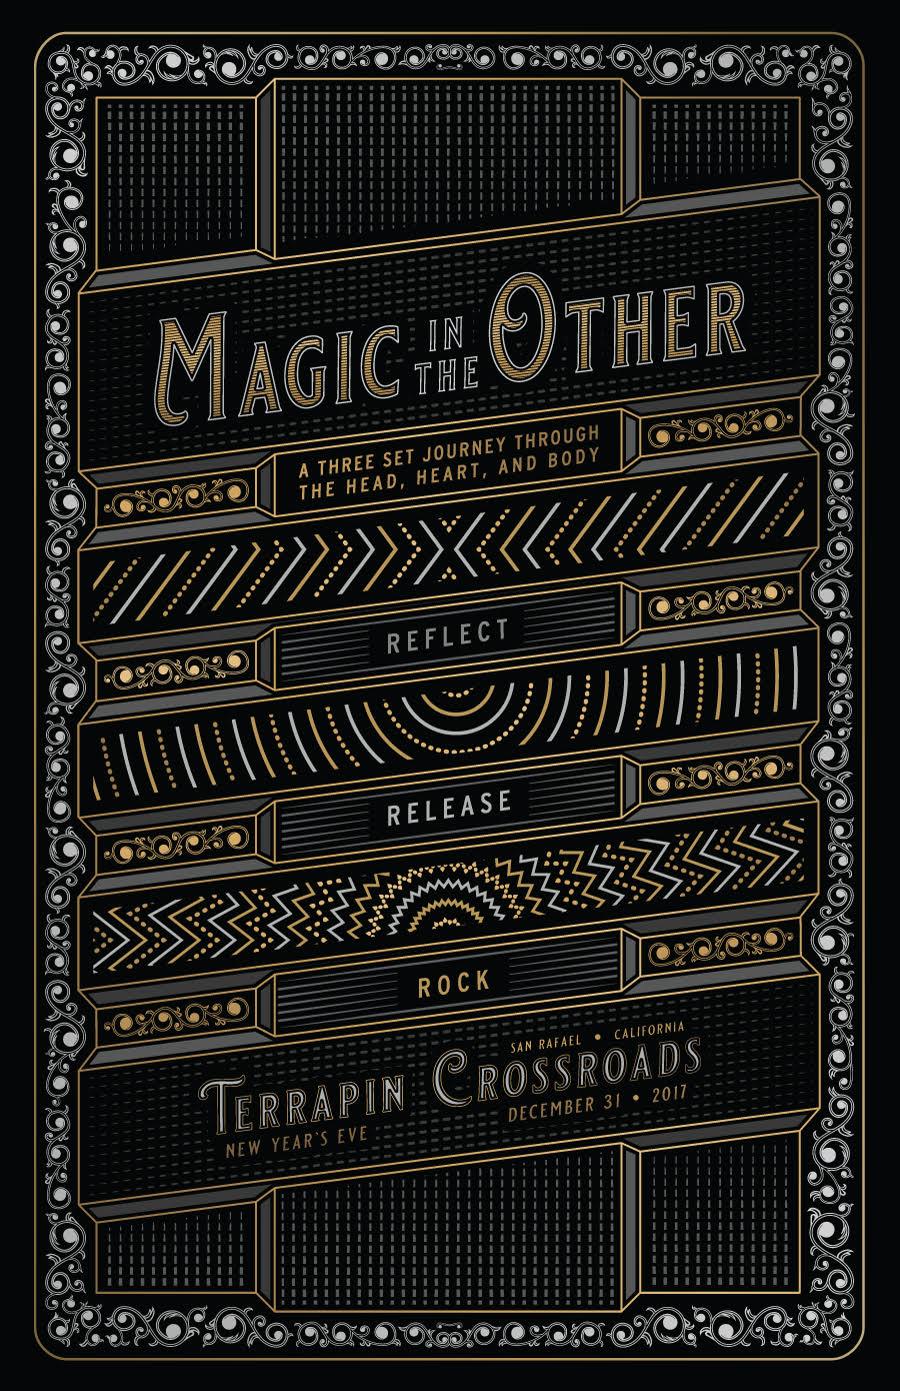 NYE MITO TxR Magic In The Other Terrapin Crossroads Chris Gallen Black Gold.jpg